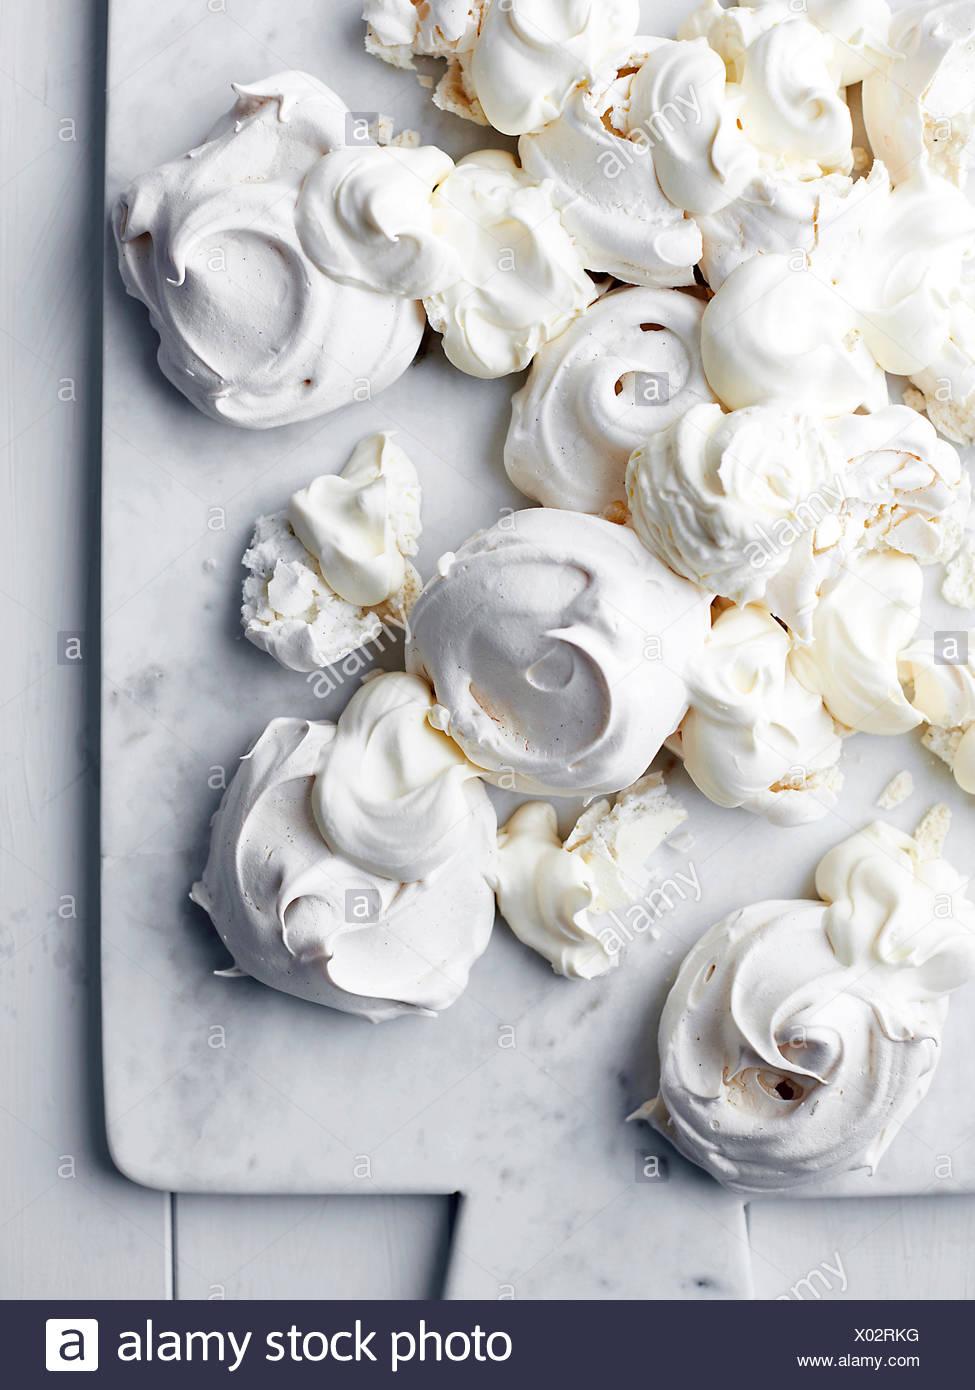 Freshly baked meringues,overhead view - Stock Image